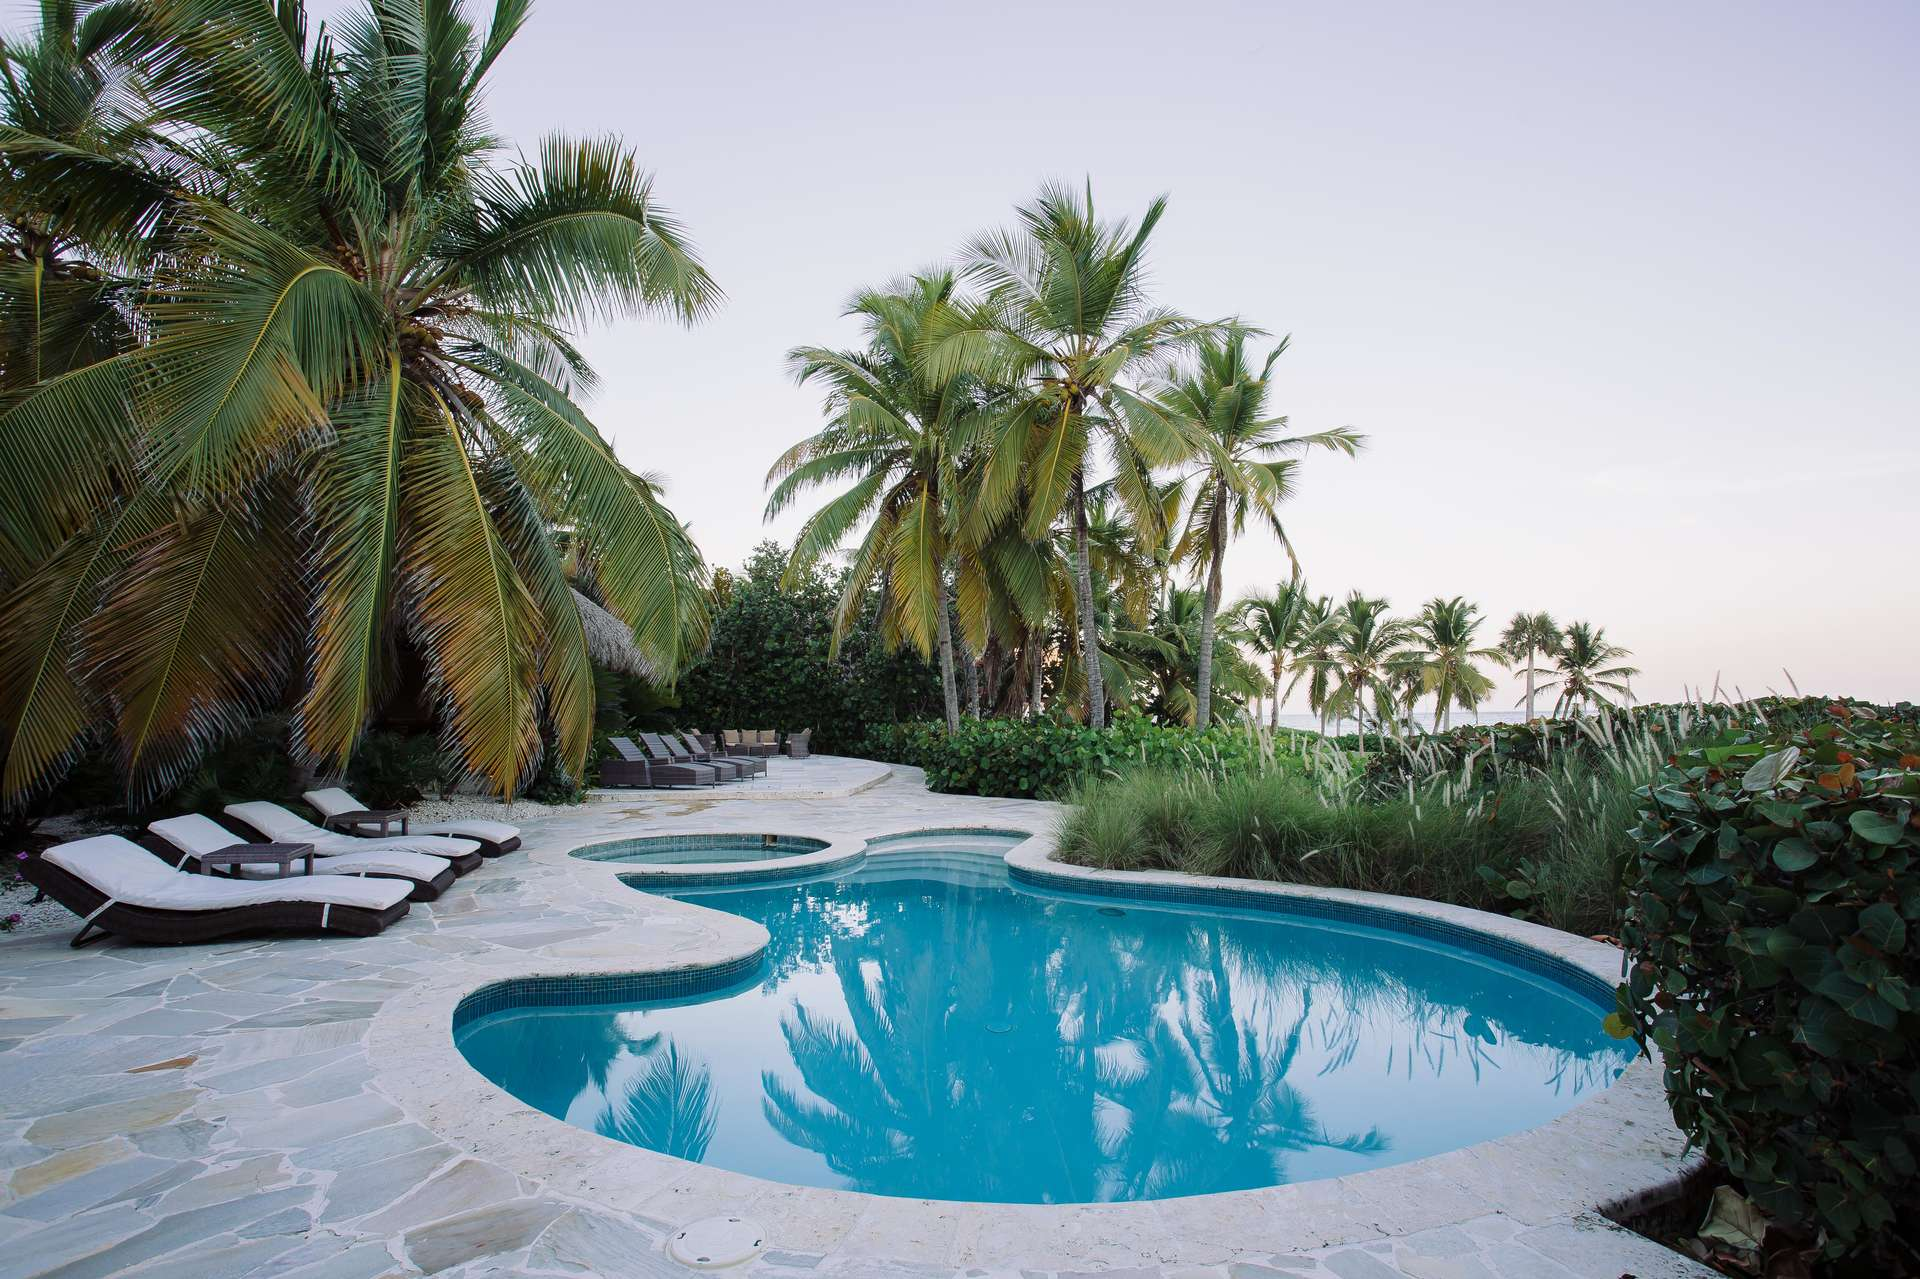 Luxury villa rentals caribbean - Dominican republic - Punta cana - Cap cana - Caleton 12 - Image 1/14